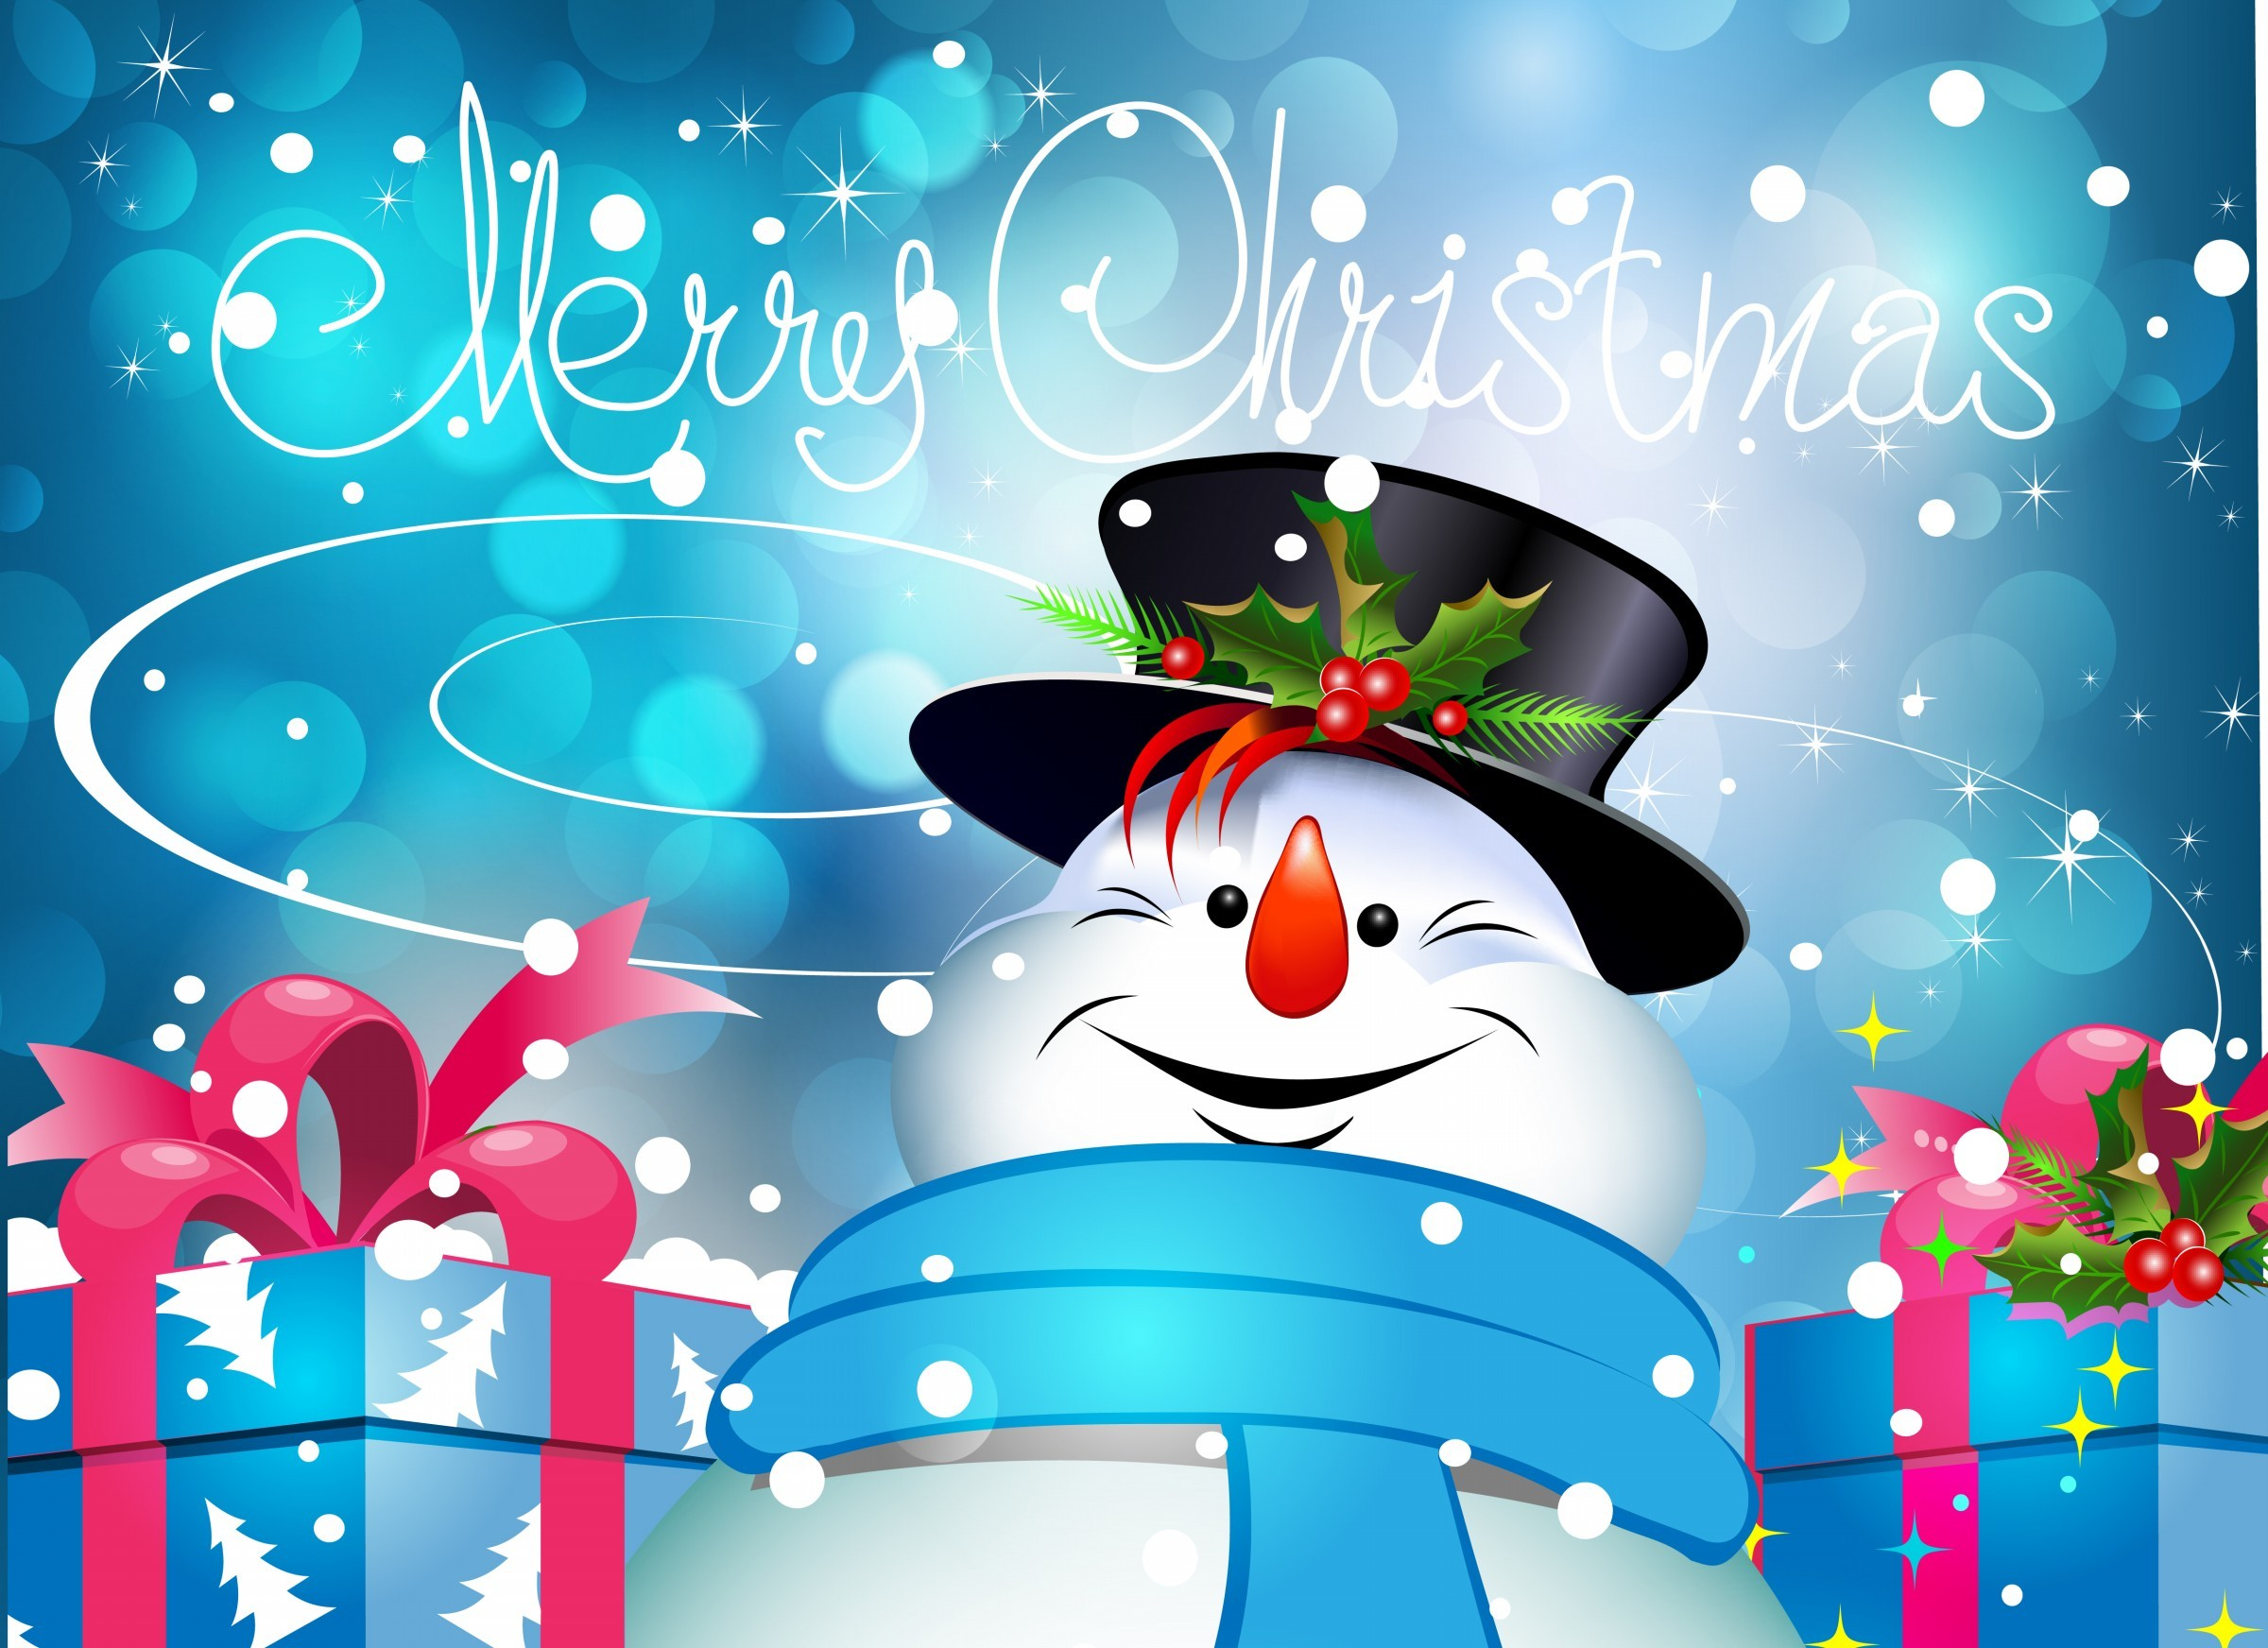 Christmas Desktop Wallpapers Free